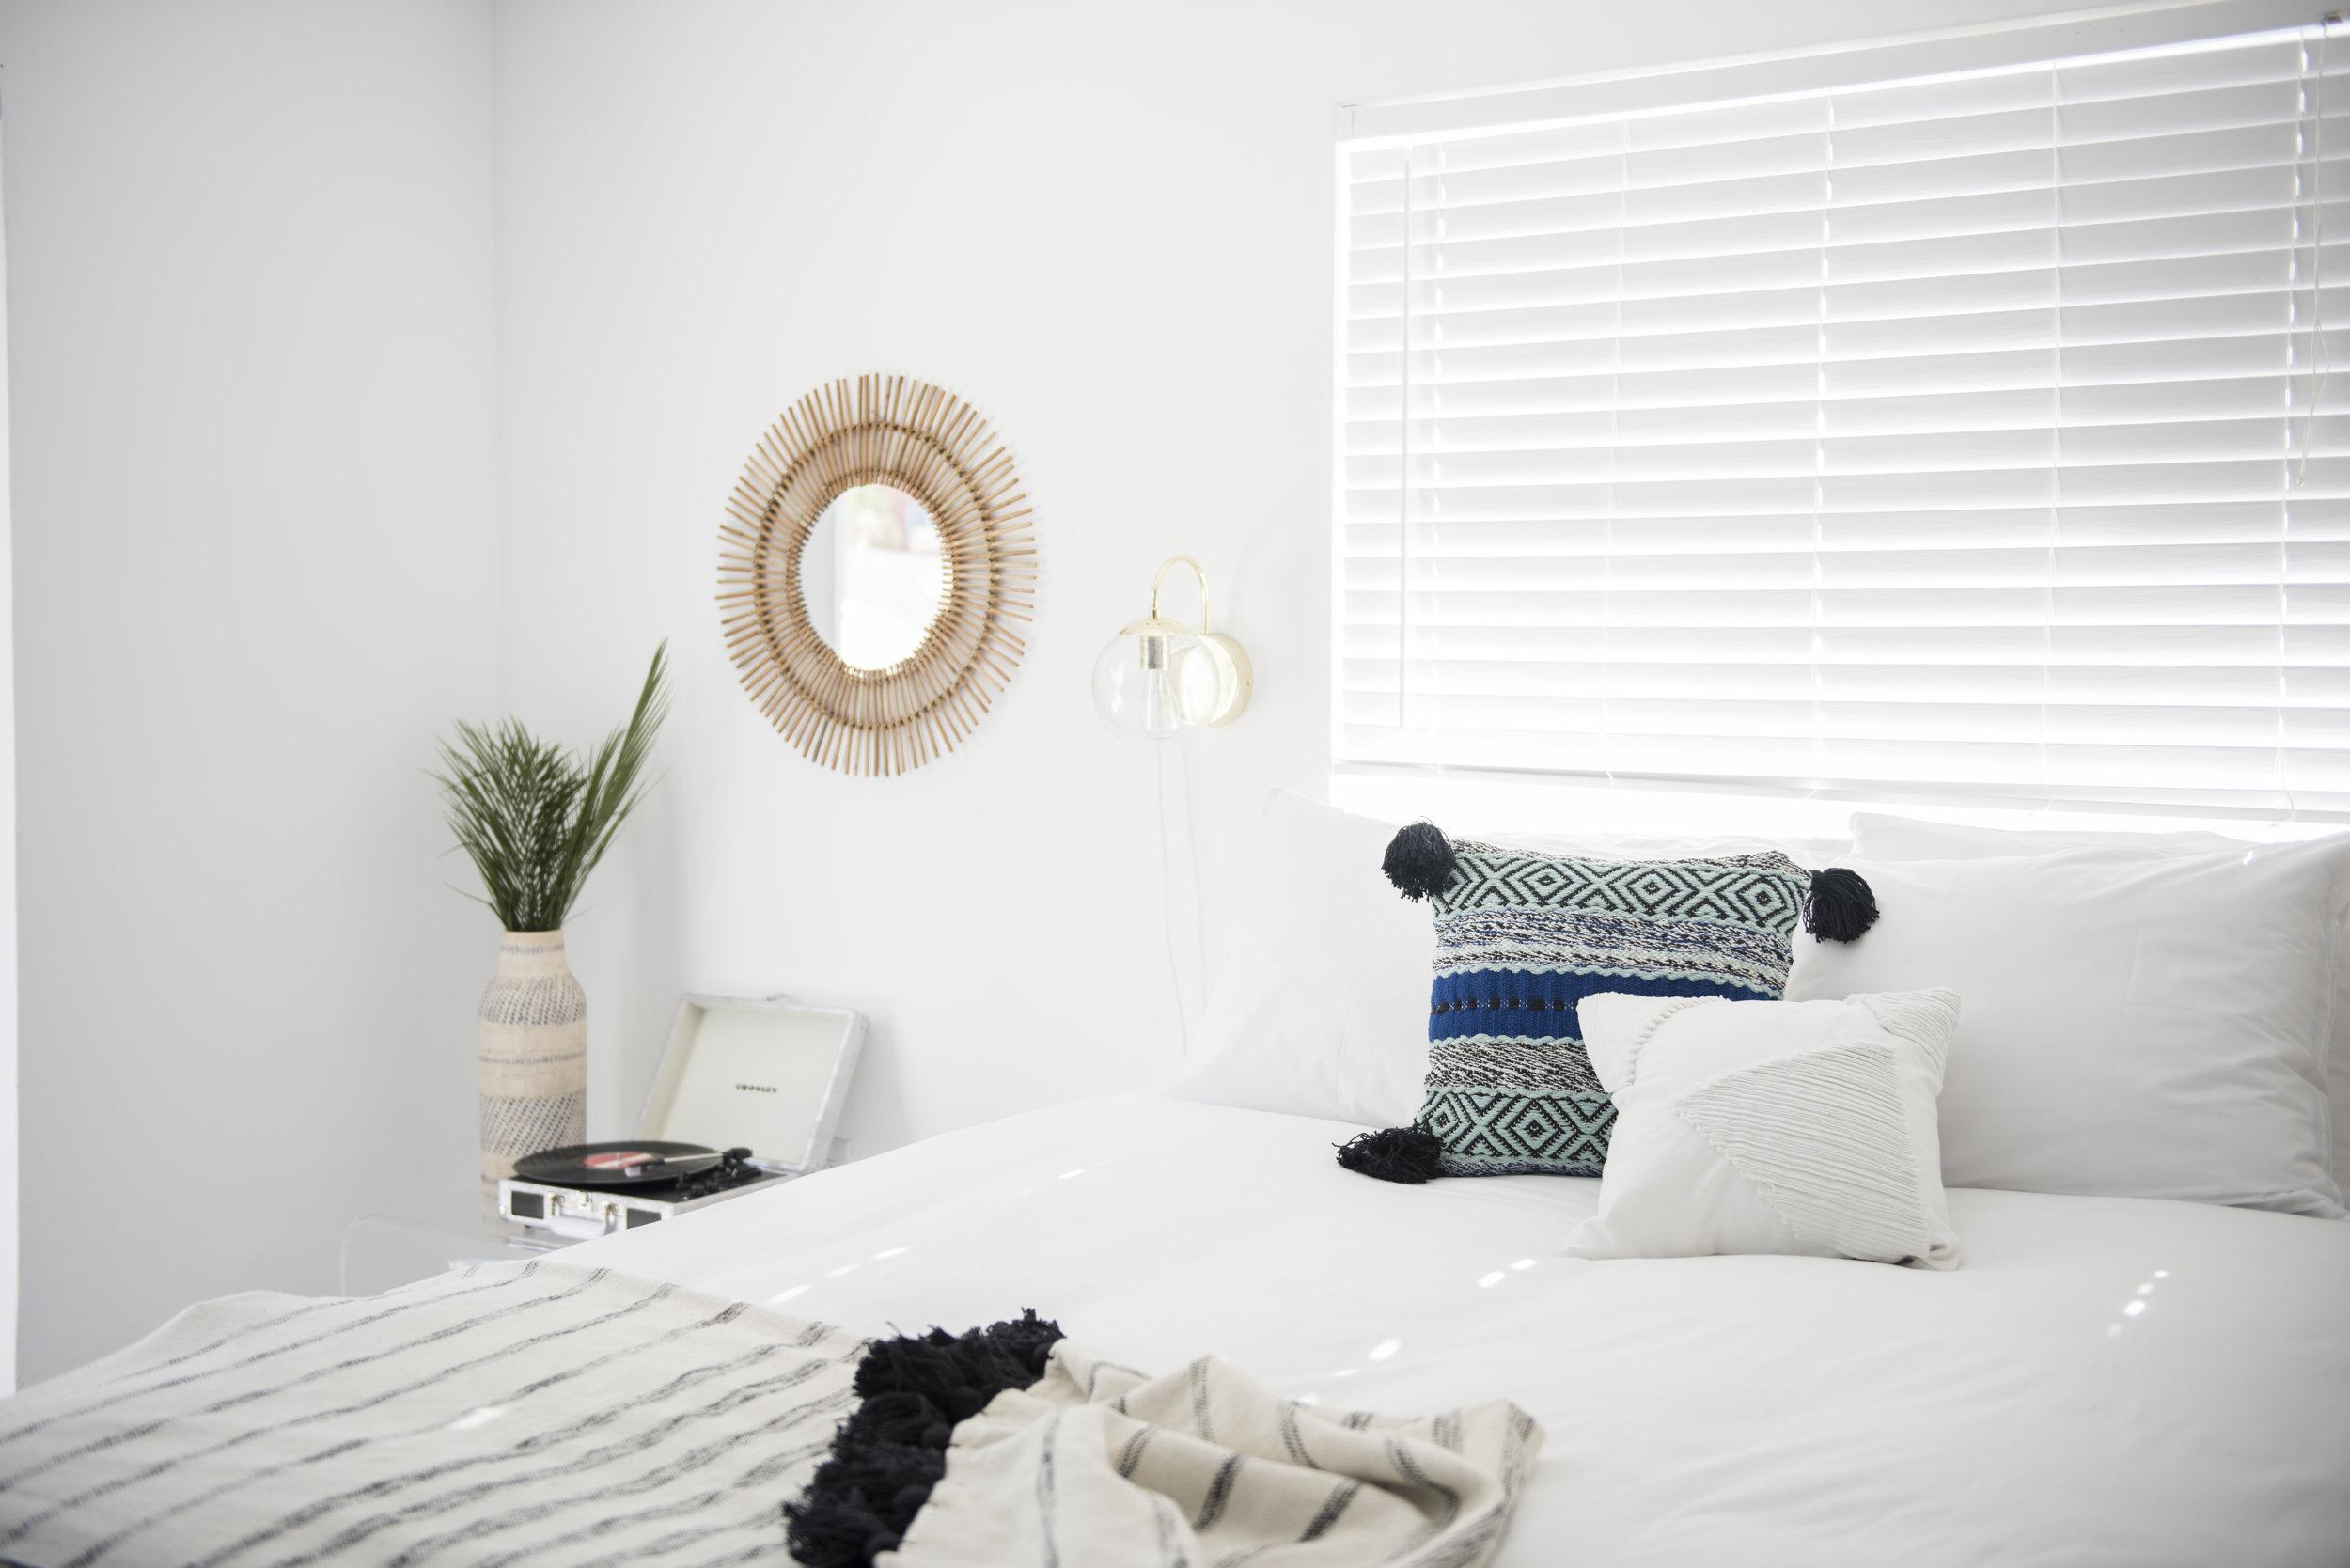 Julia Sperling Photography for Sonder Apartment in Miami 03.jpg